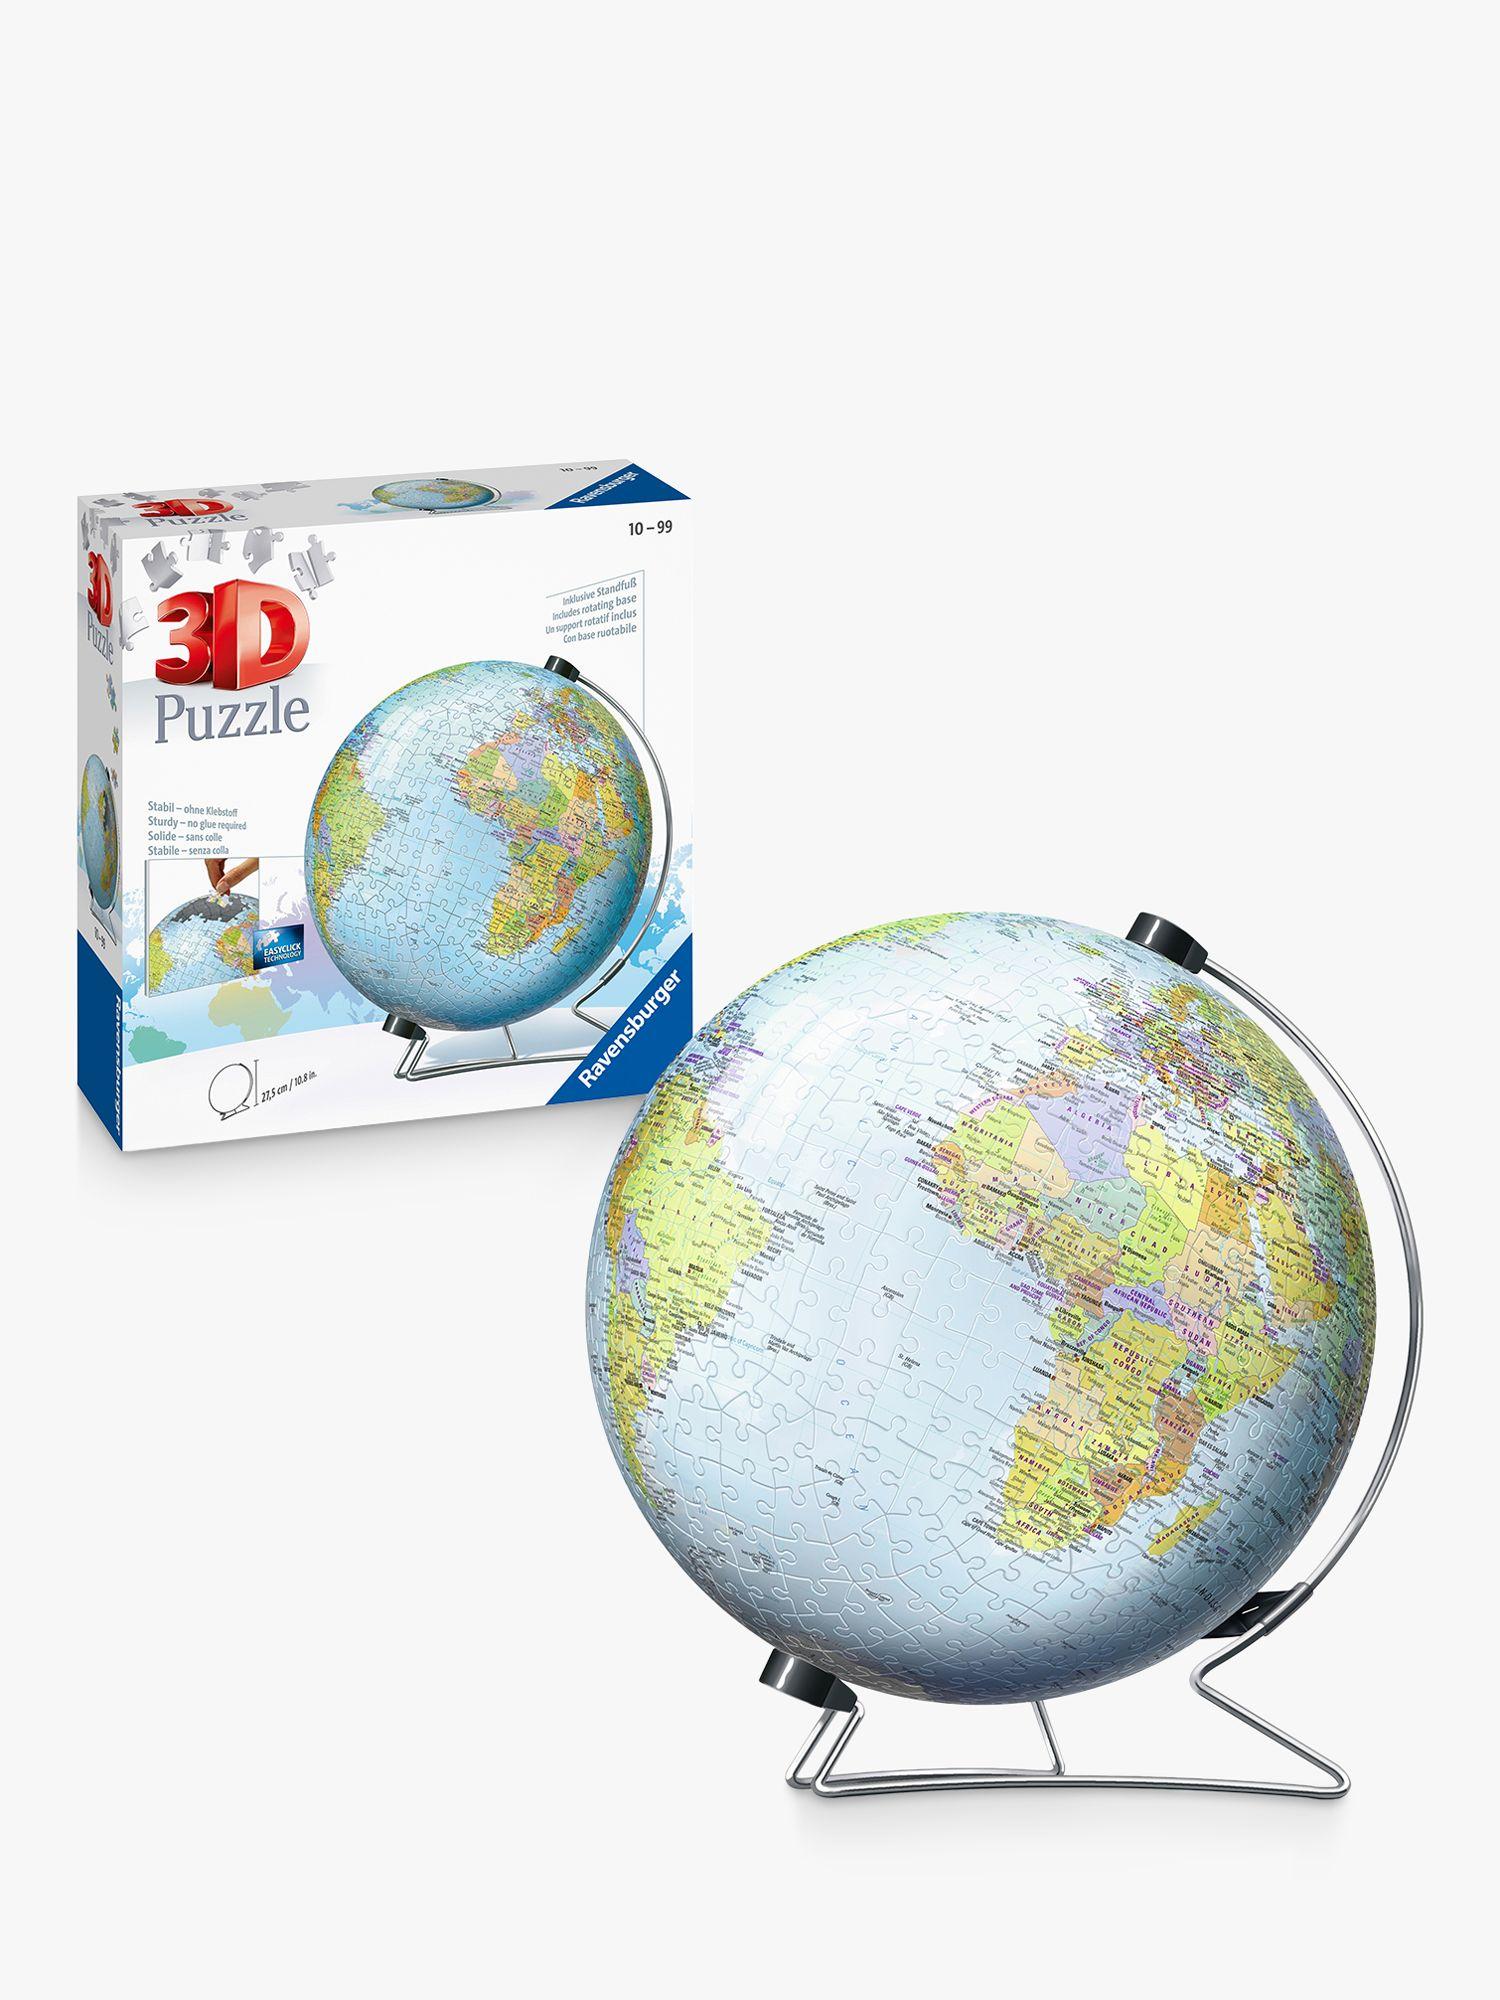 Ravensburger Ravensburger The World 3D Jigsaw Puzzle, 540 Pieces